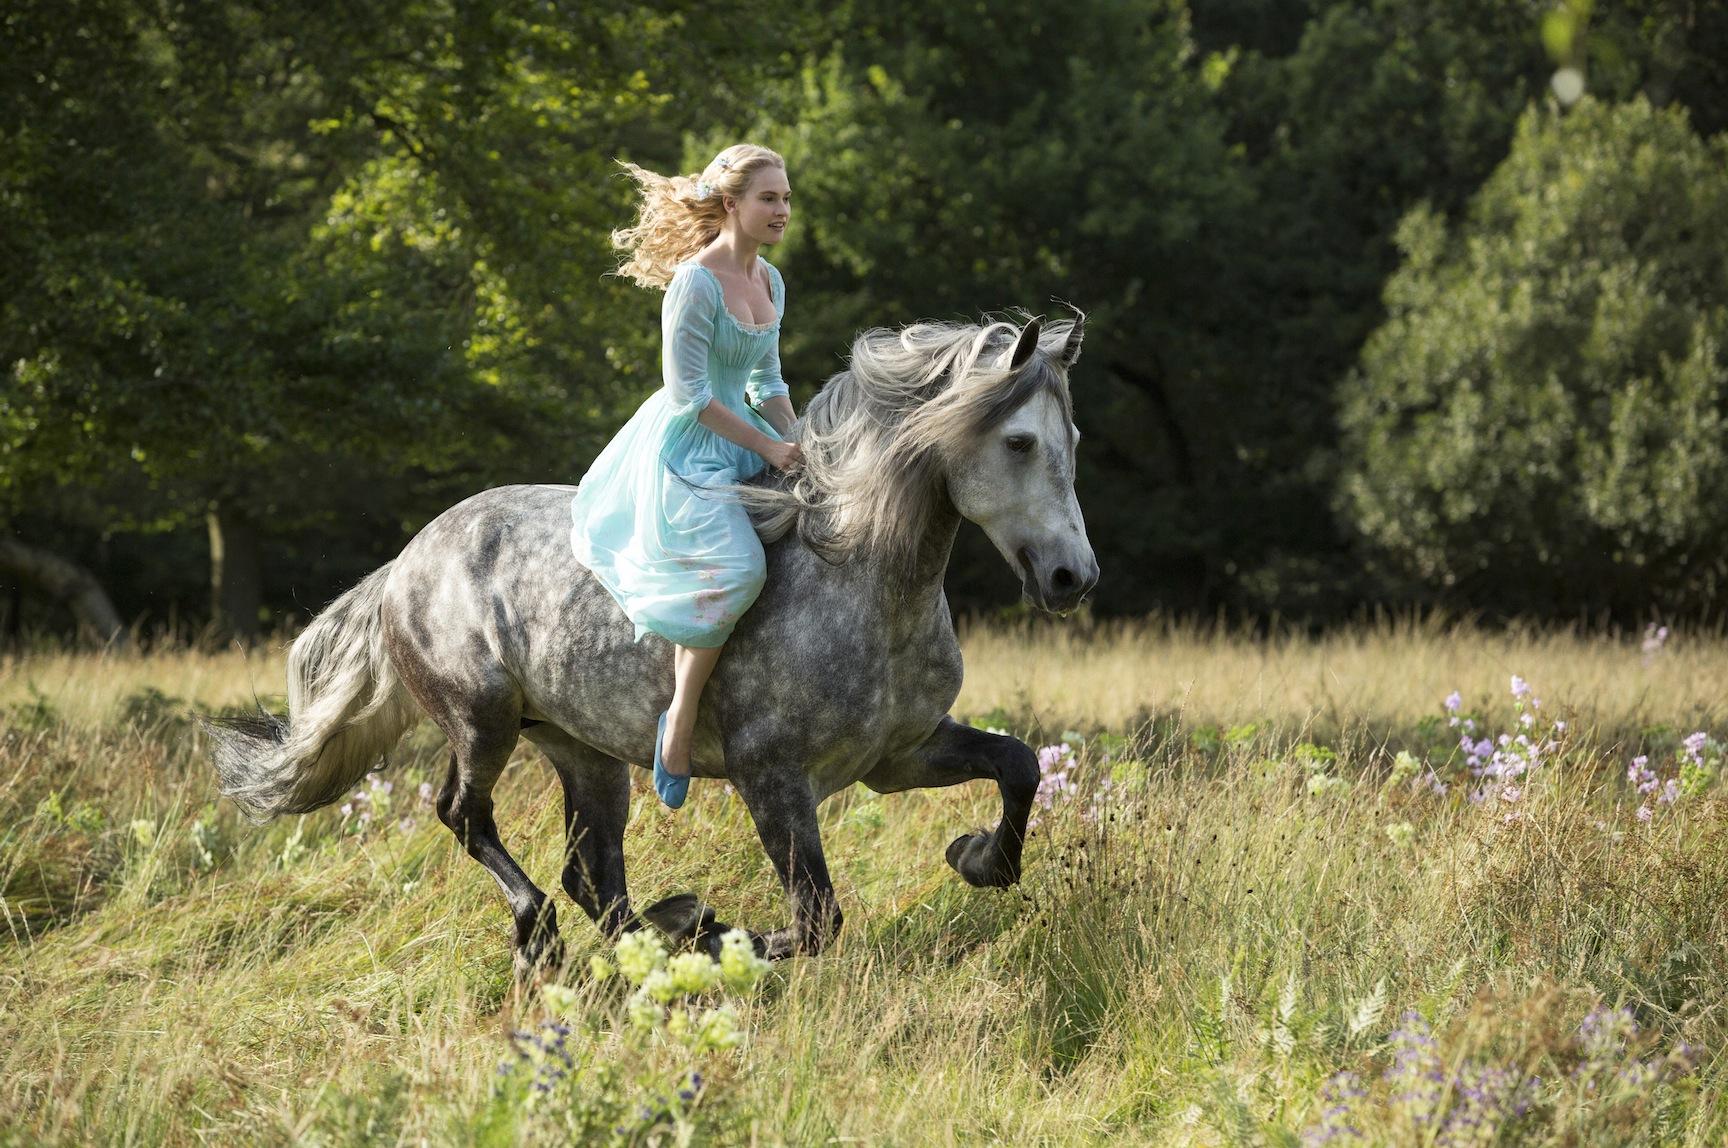 TEASER: Disney's Cinderella